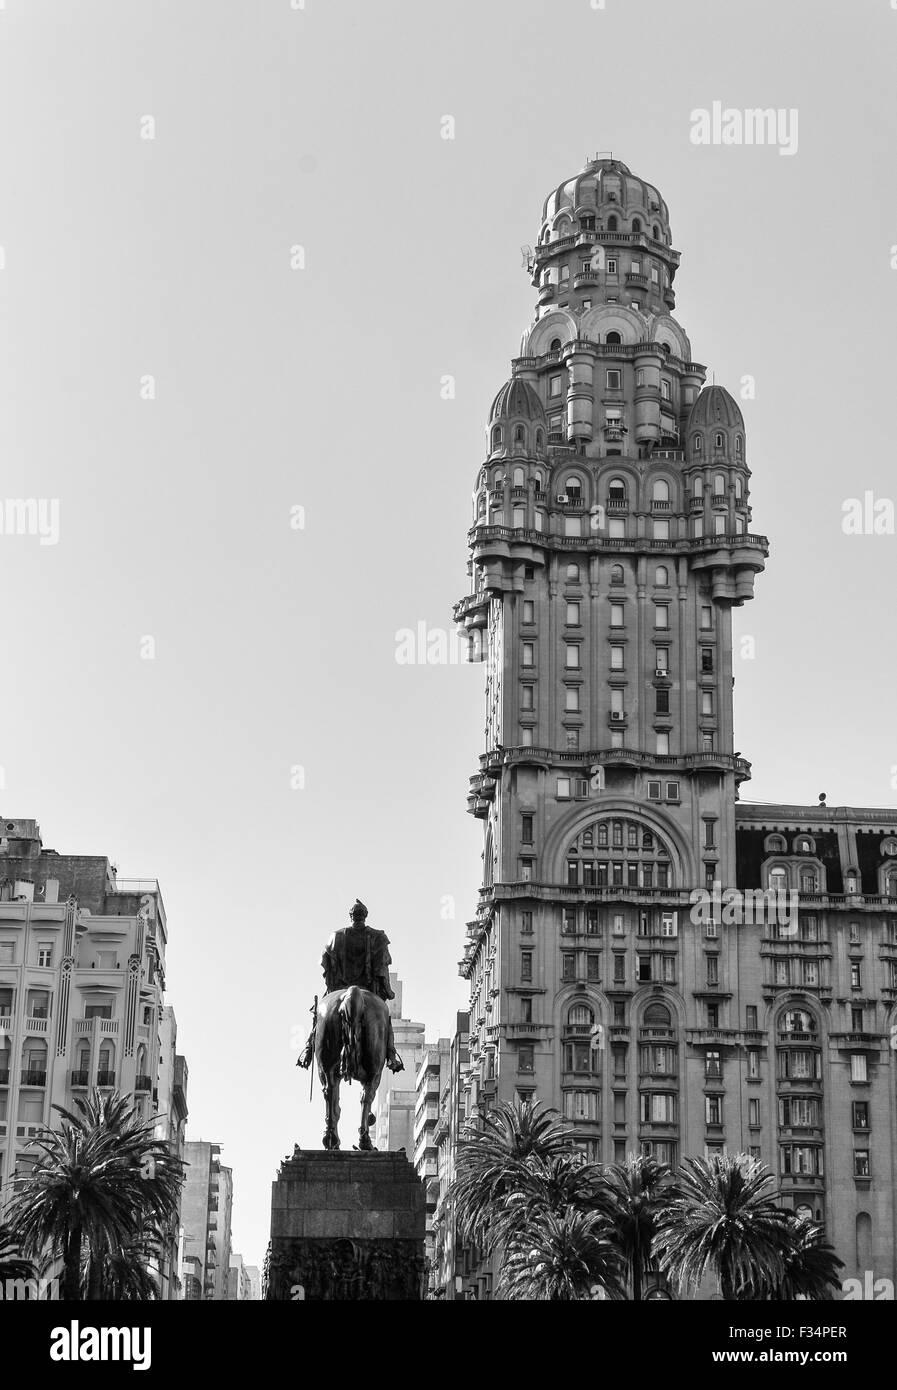 Montevideo Plaza de la Independencia with national hero Artigas statue - Stock Image